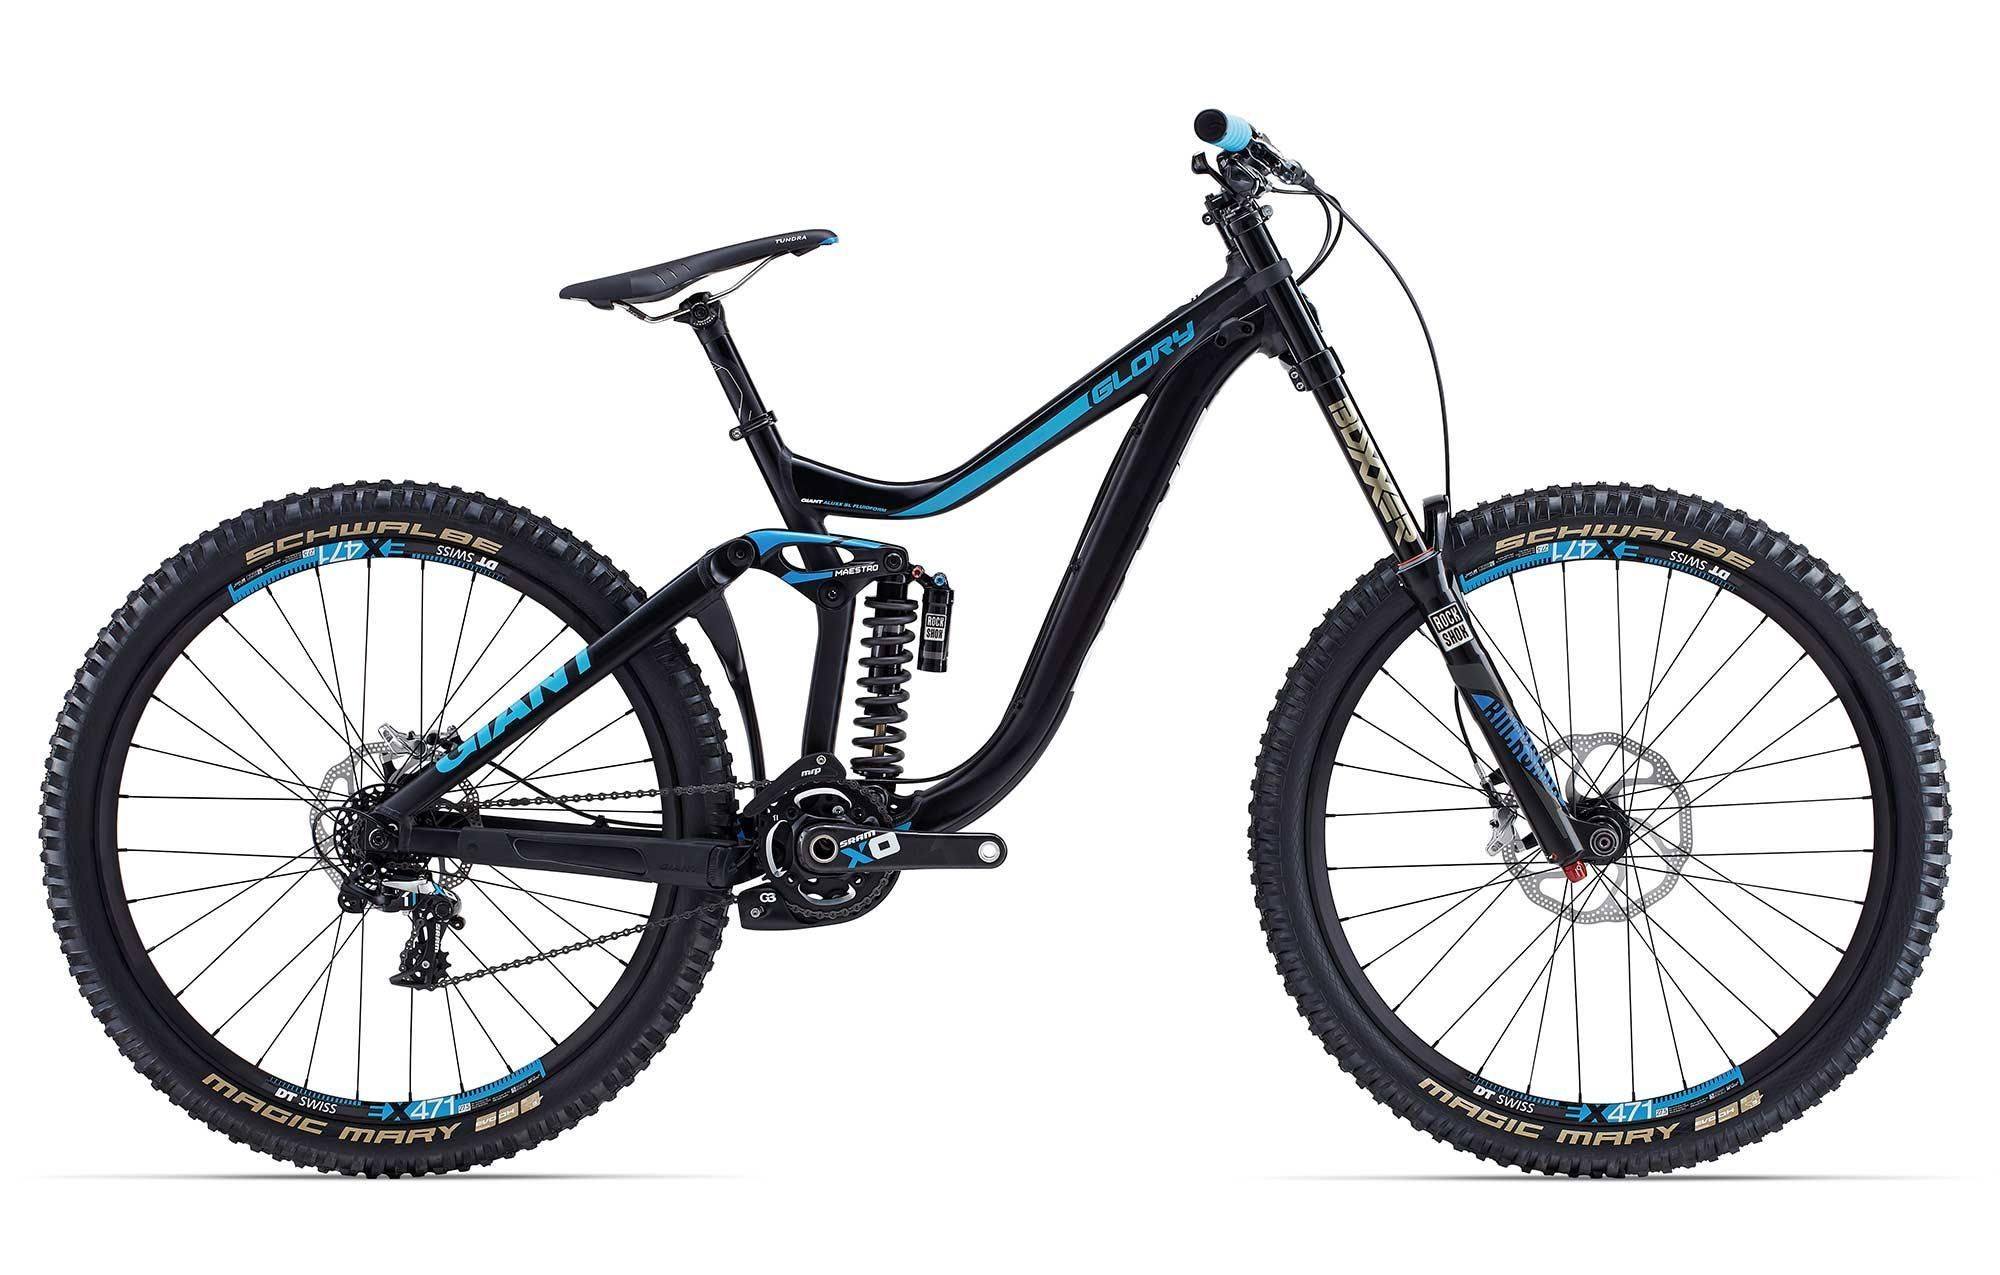 Giant Glory 27 5 0 2015 Mountain Bike Giant Bicycle Downhill